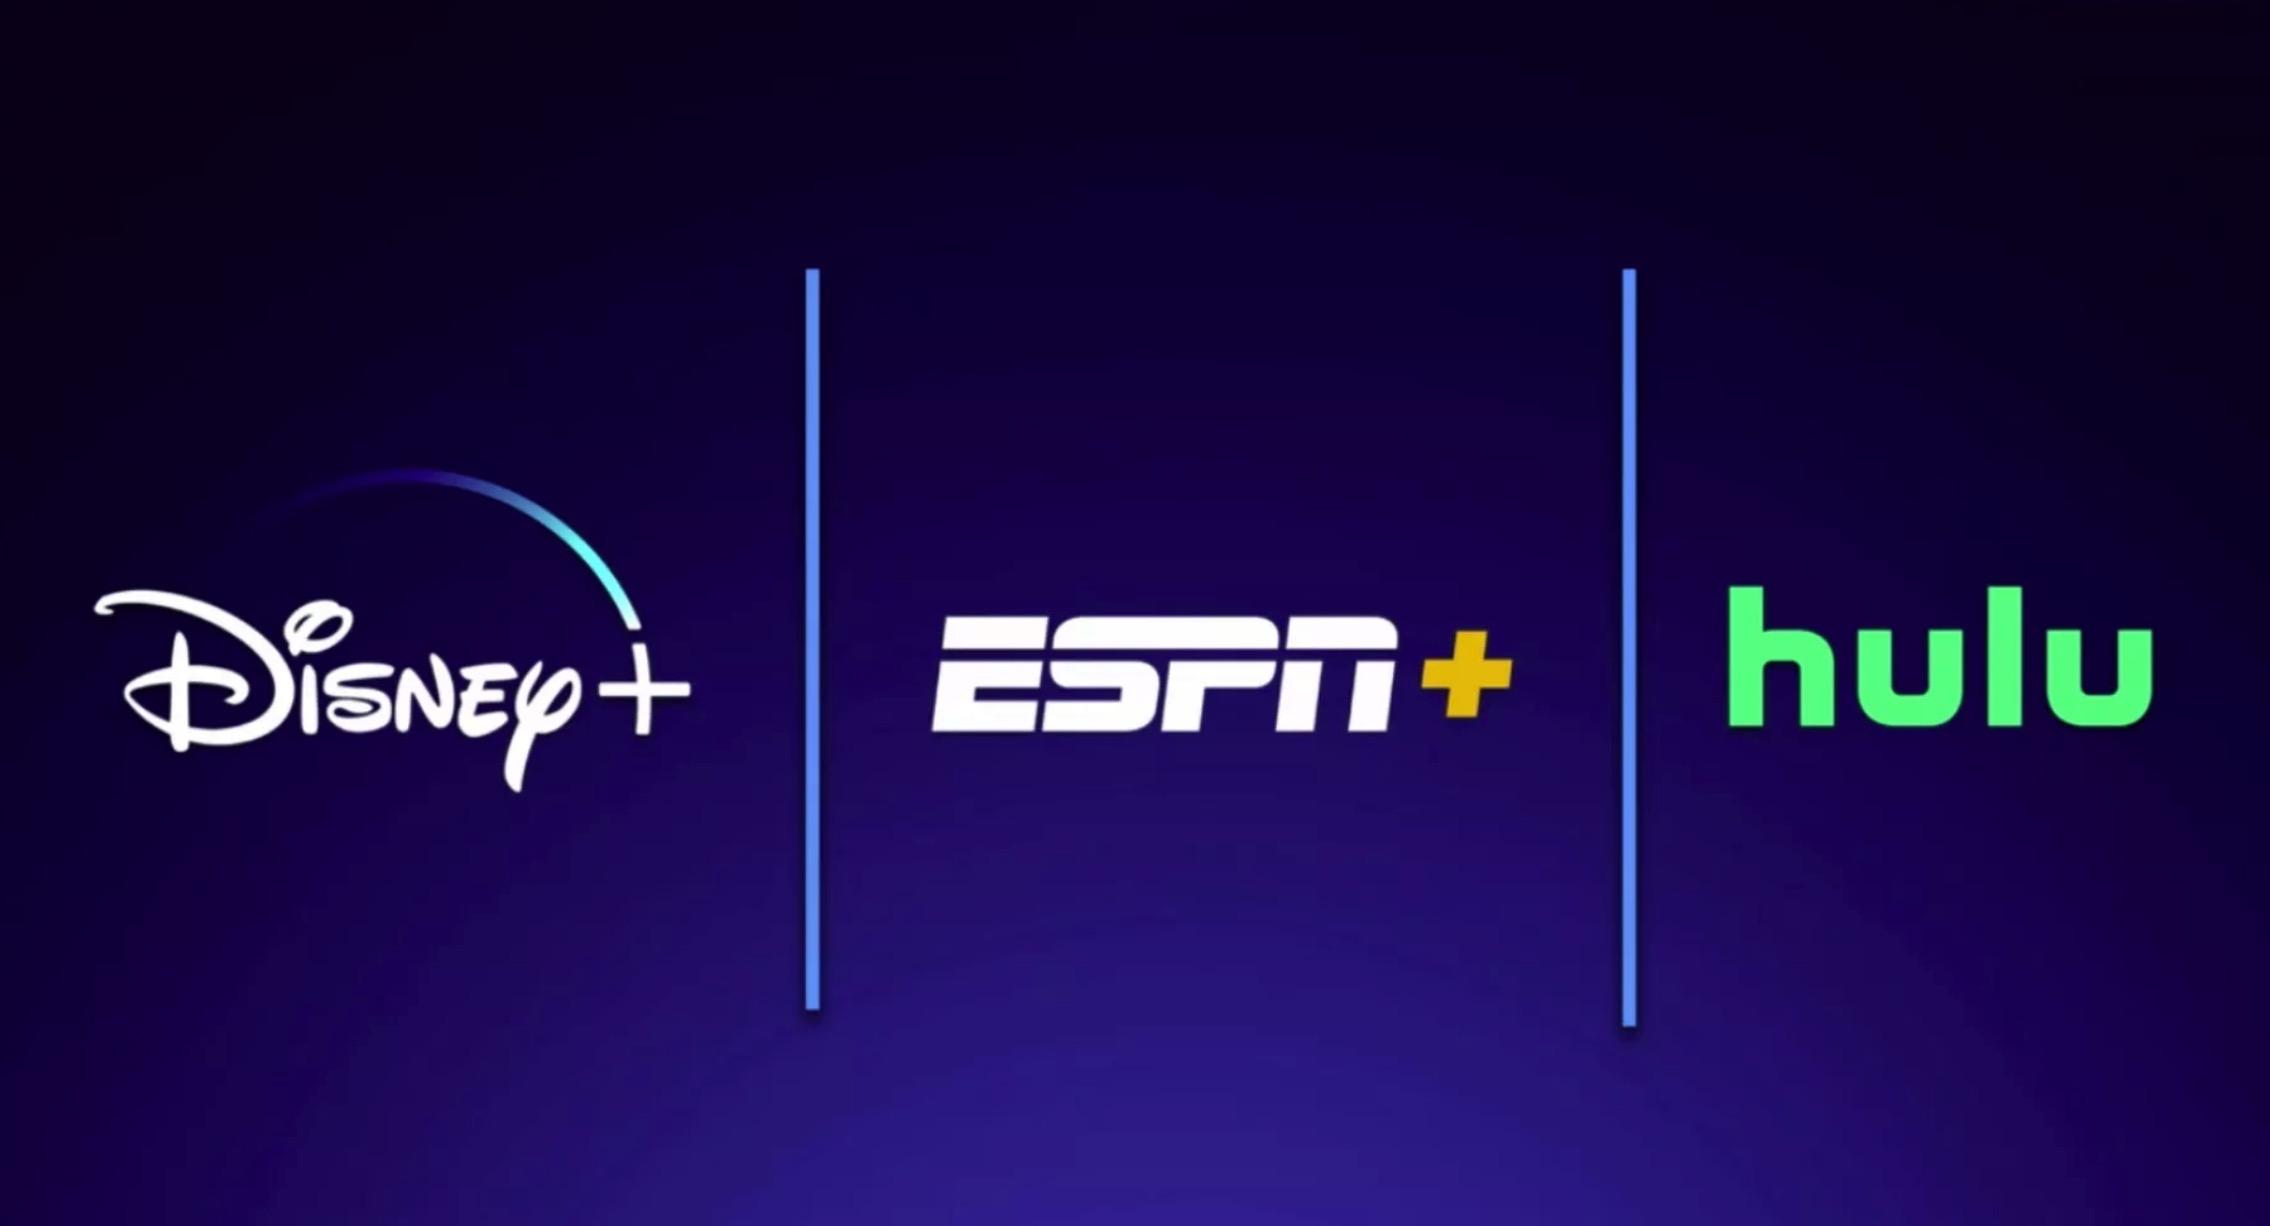 disneybundle 364x205 - Disney announces affordable Disney+, Hulu and ESPN+ bundle